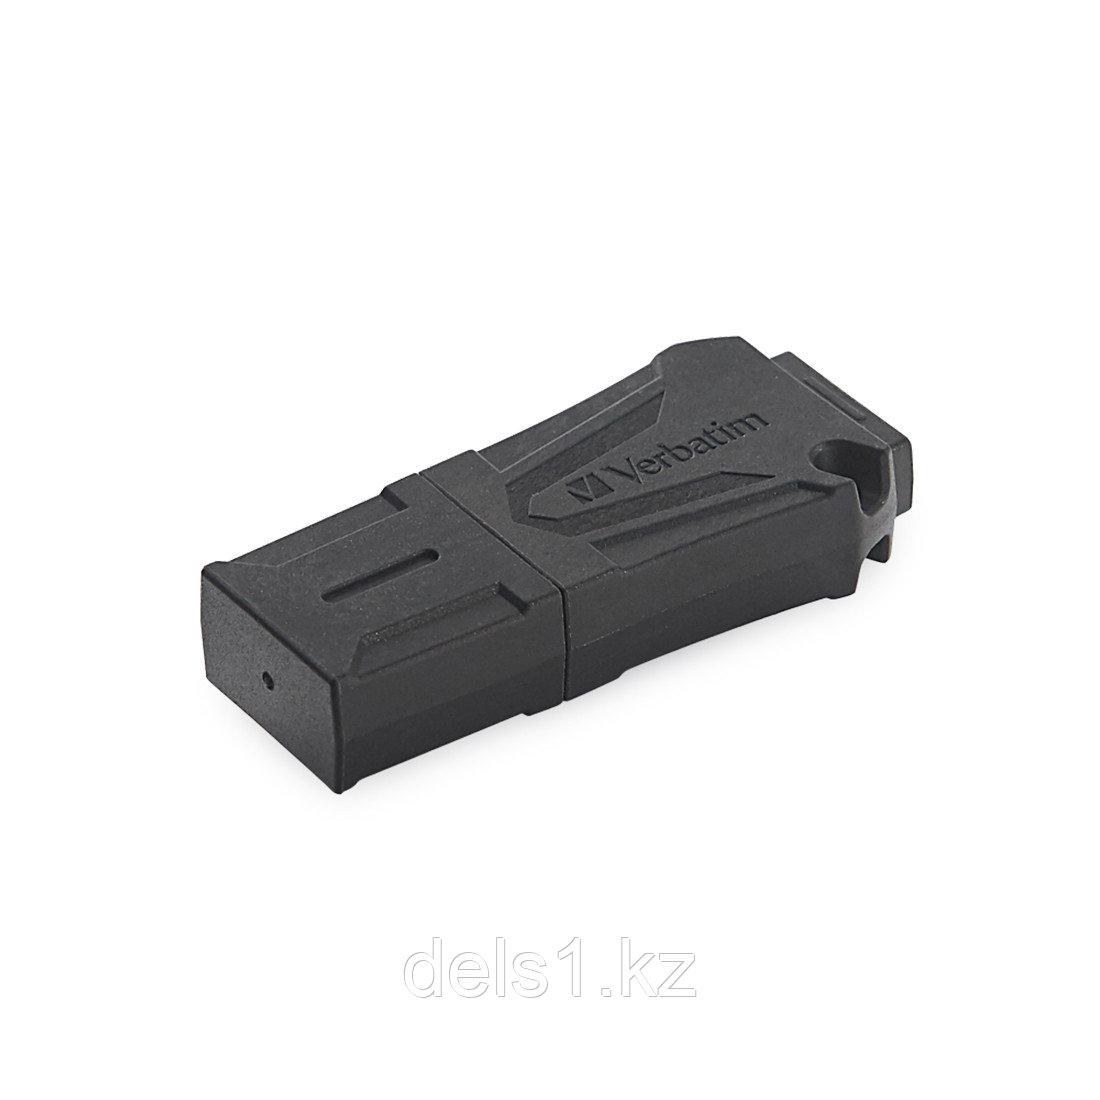 USB-накопитель Verbatim 49331 32GB USB 2.0 Чёрный